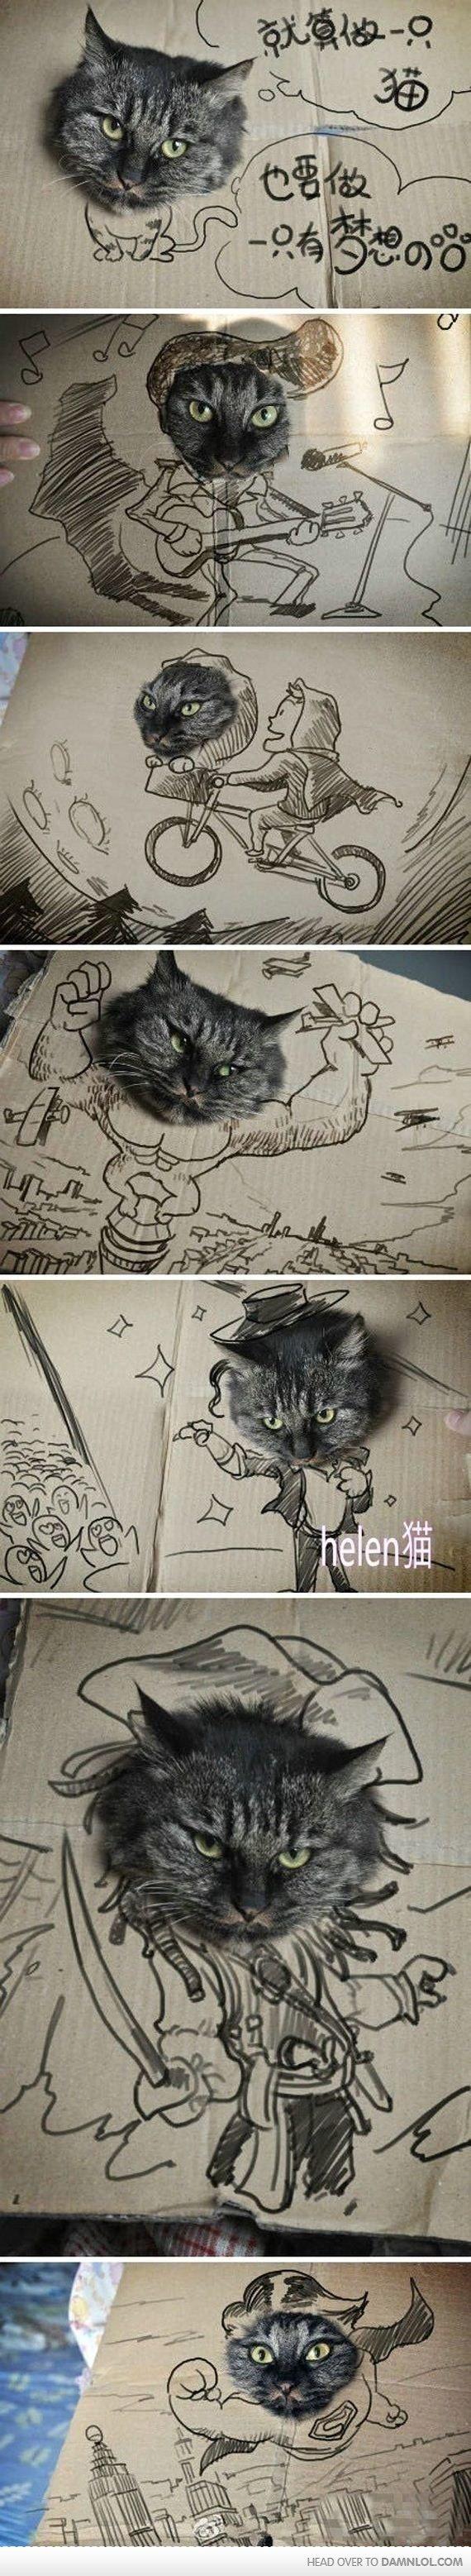 Cats. Cats cats cats cats. Cats